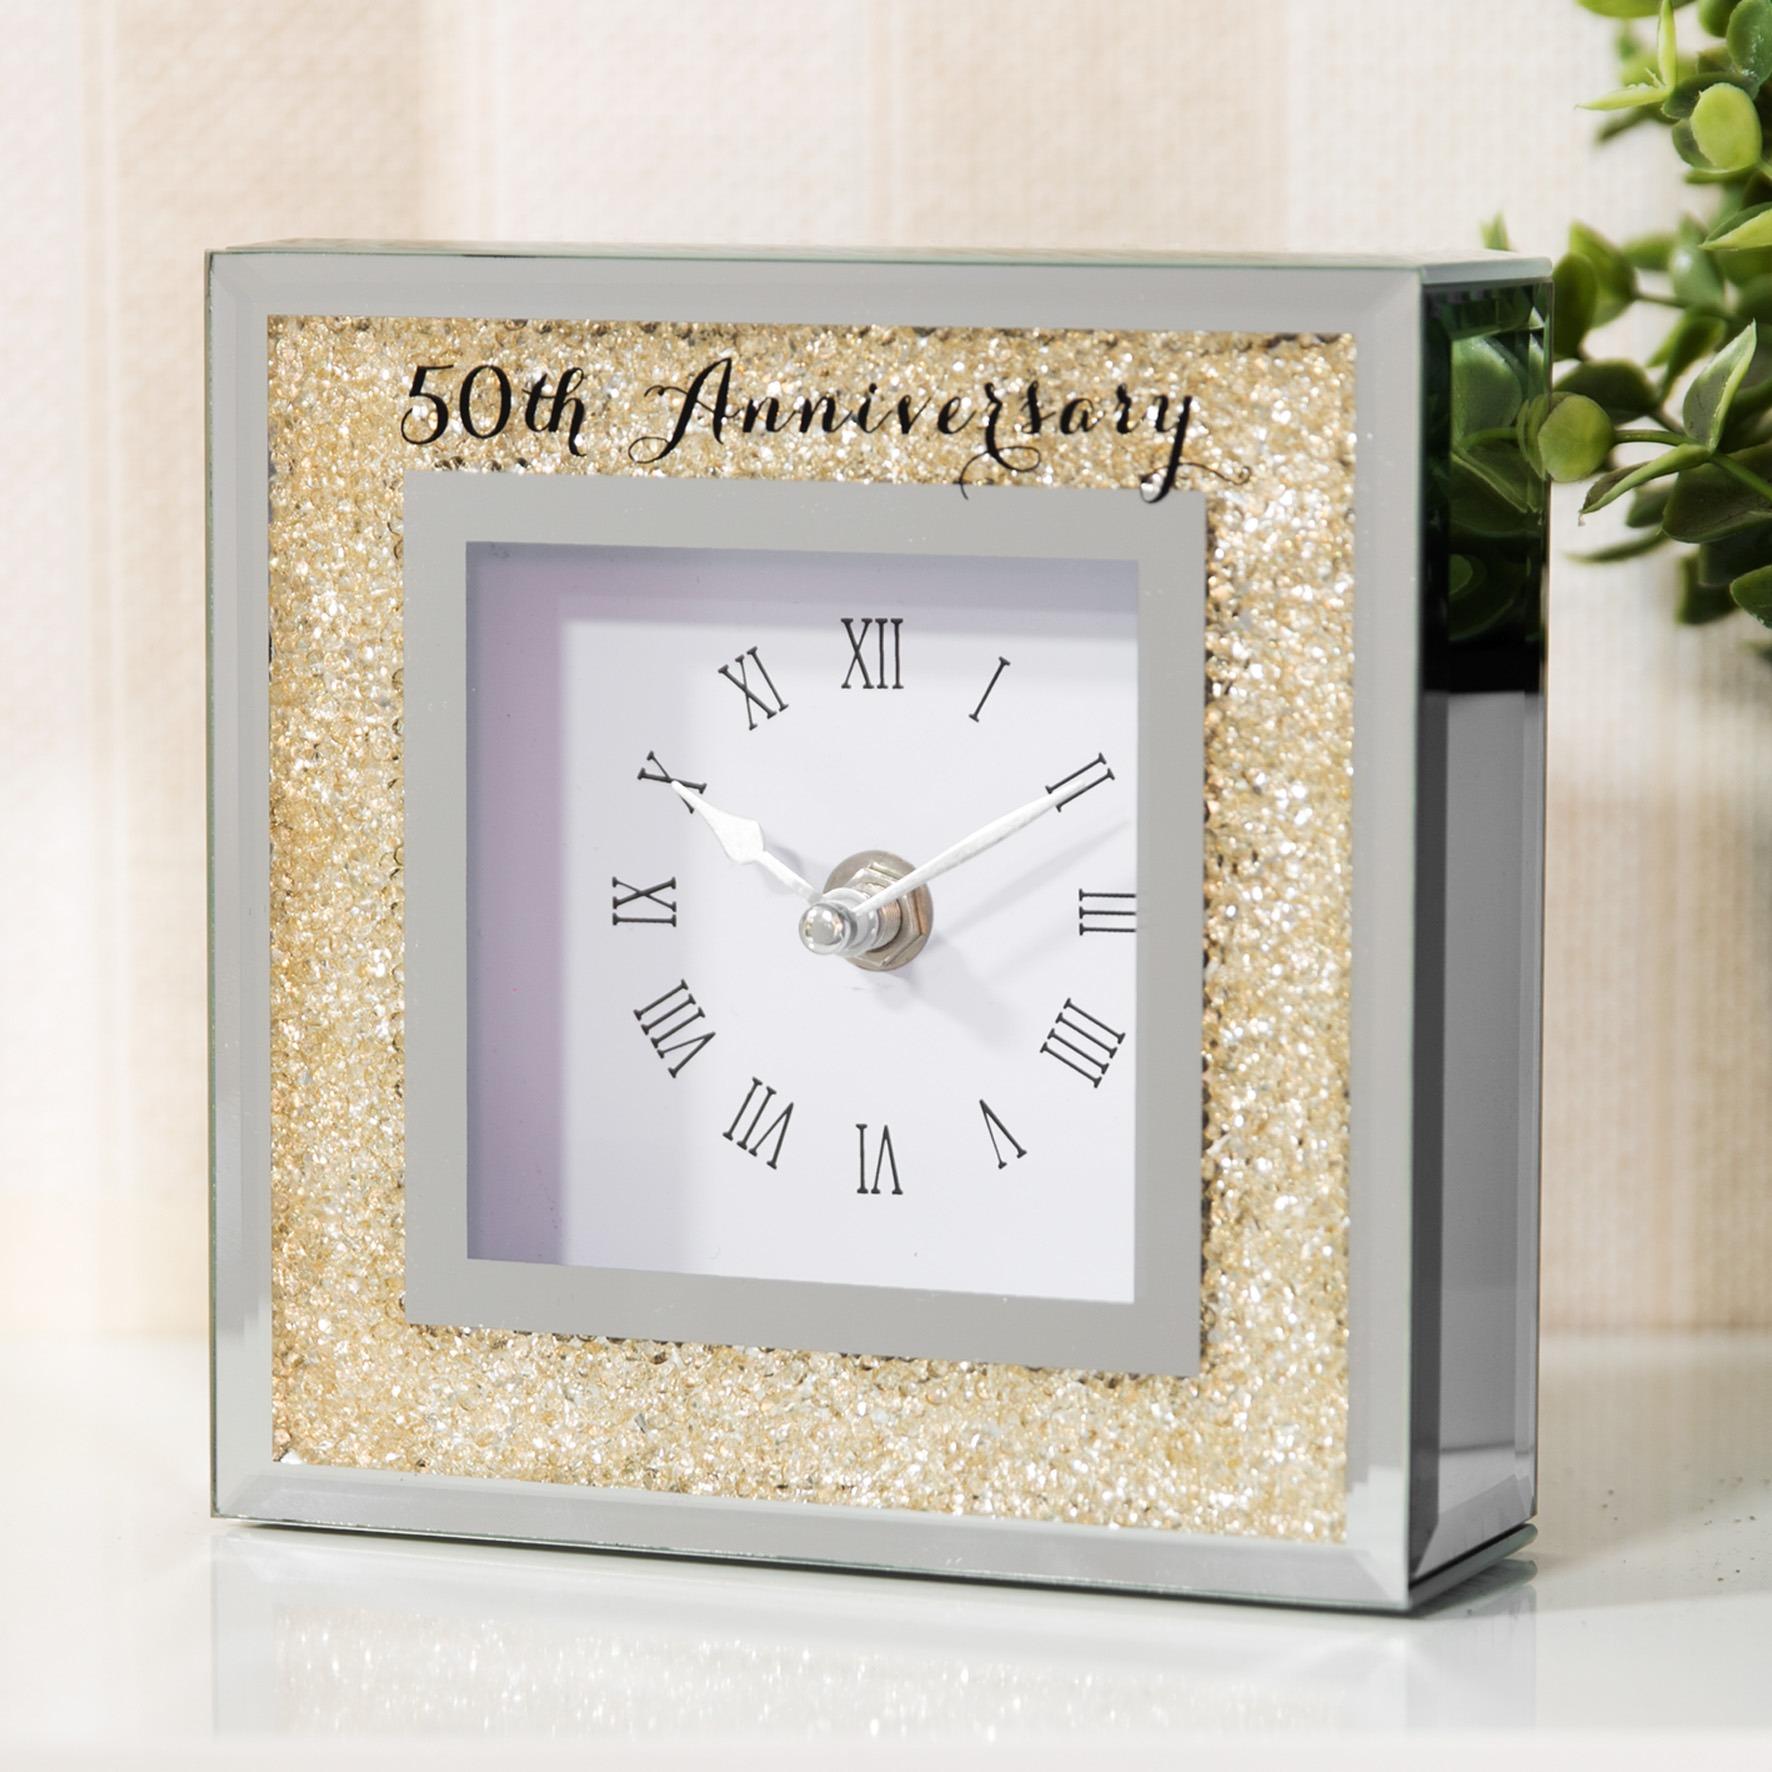 personalised engraved glass clock  golden anniversary diamond anniversary